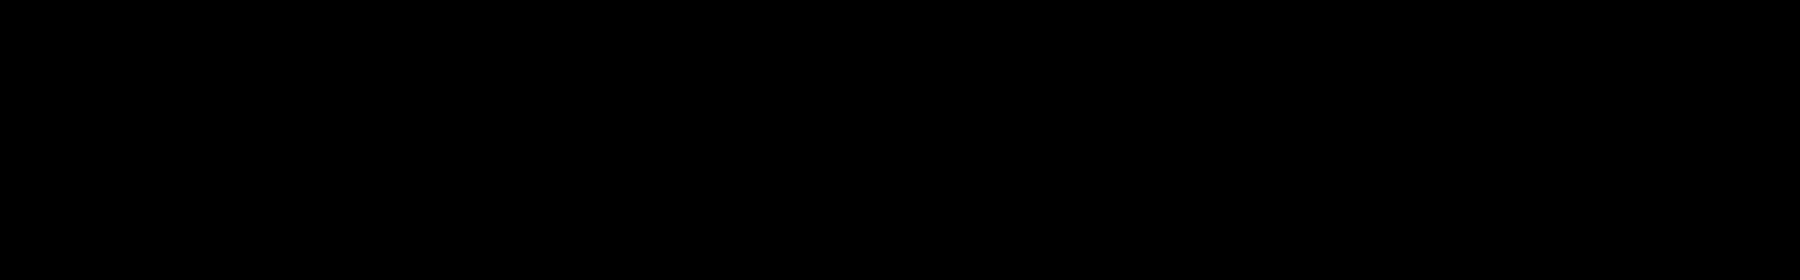 Techno Maschinen audio waveform